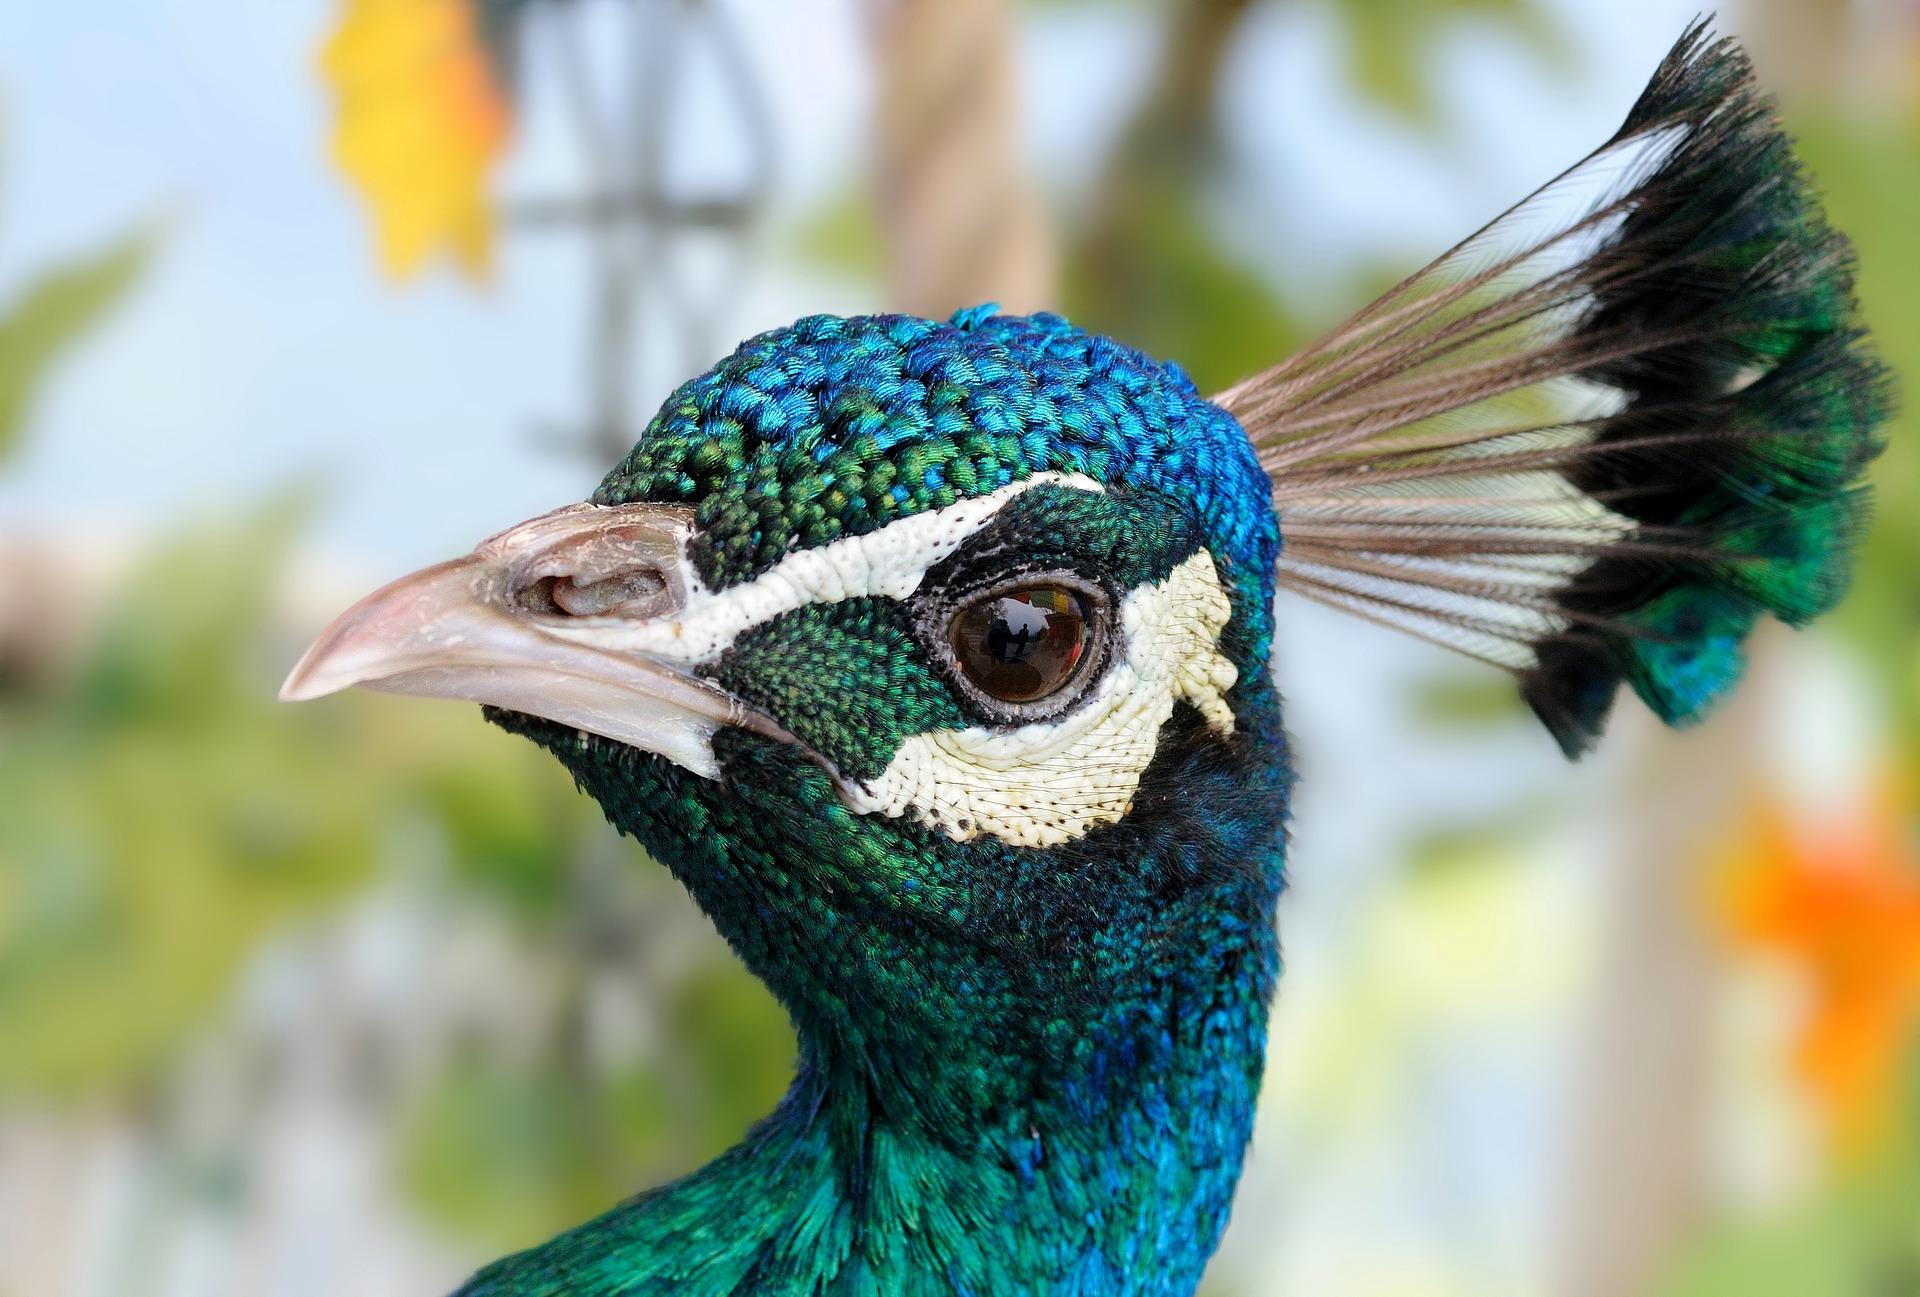 Raising Peacocks: 5 Steps You Need to Know to Keep Peafowl